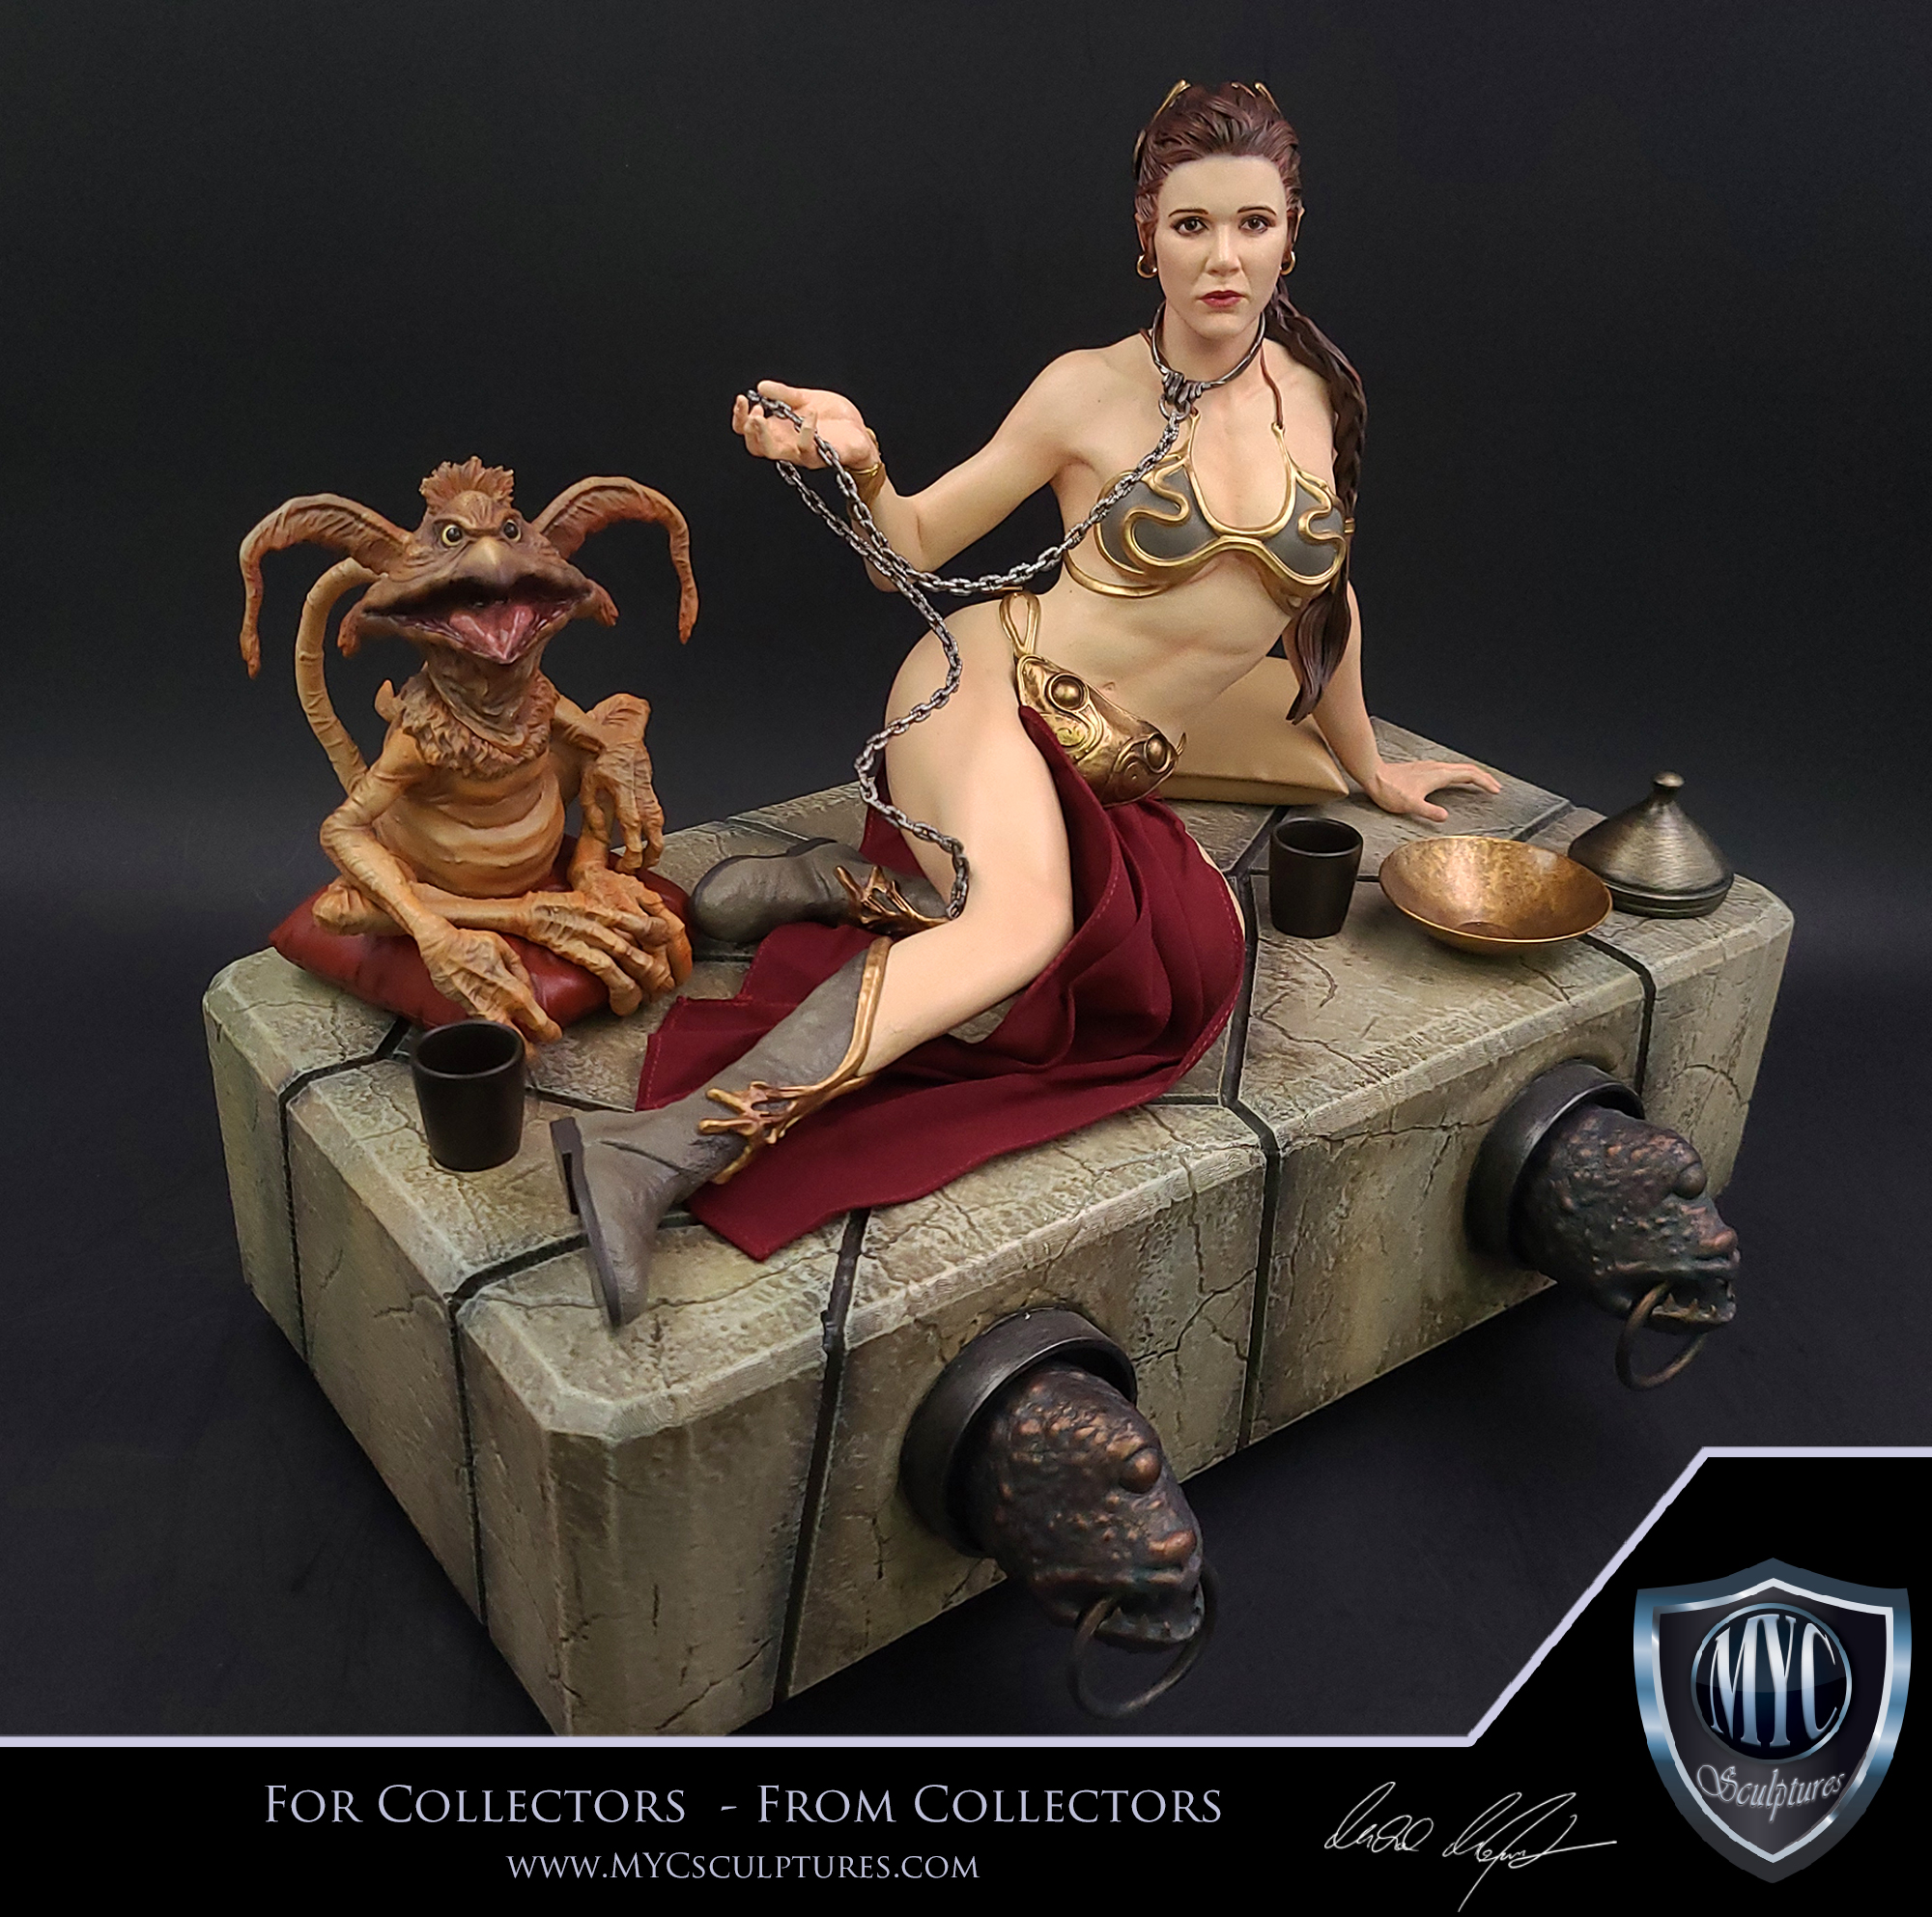 Slave_Leia_V2_MYC_Sculptures_02